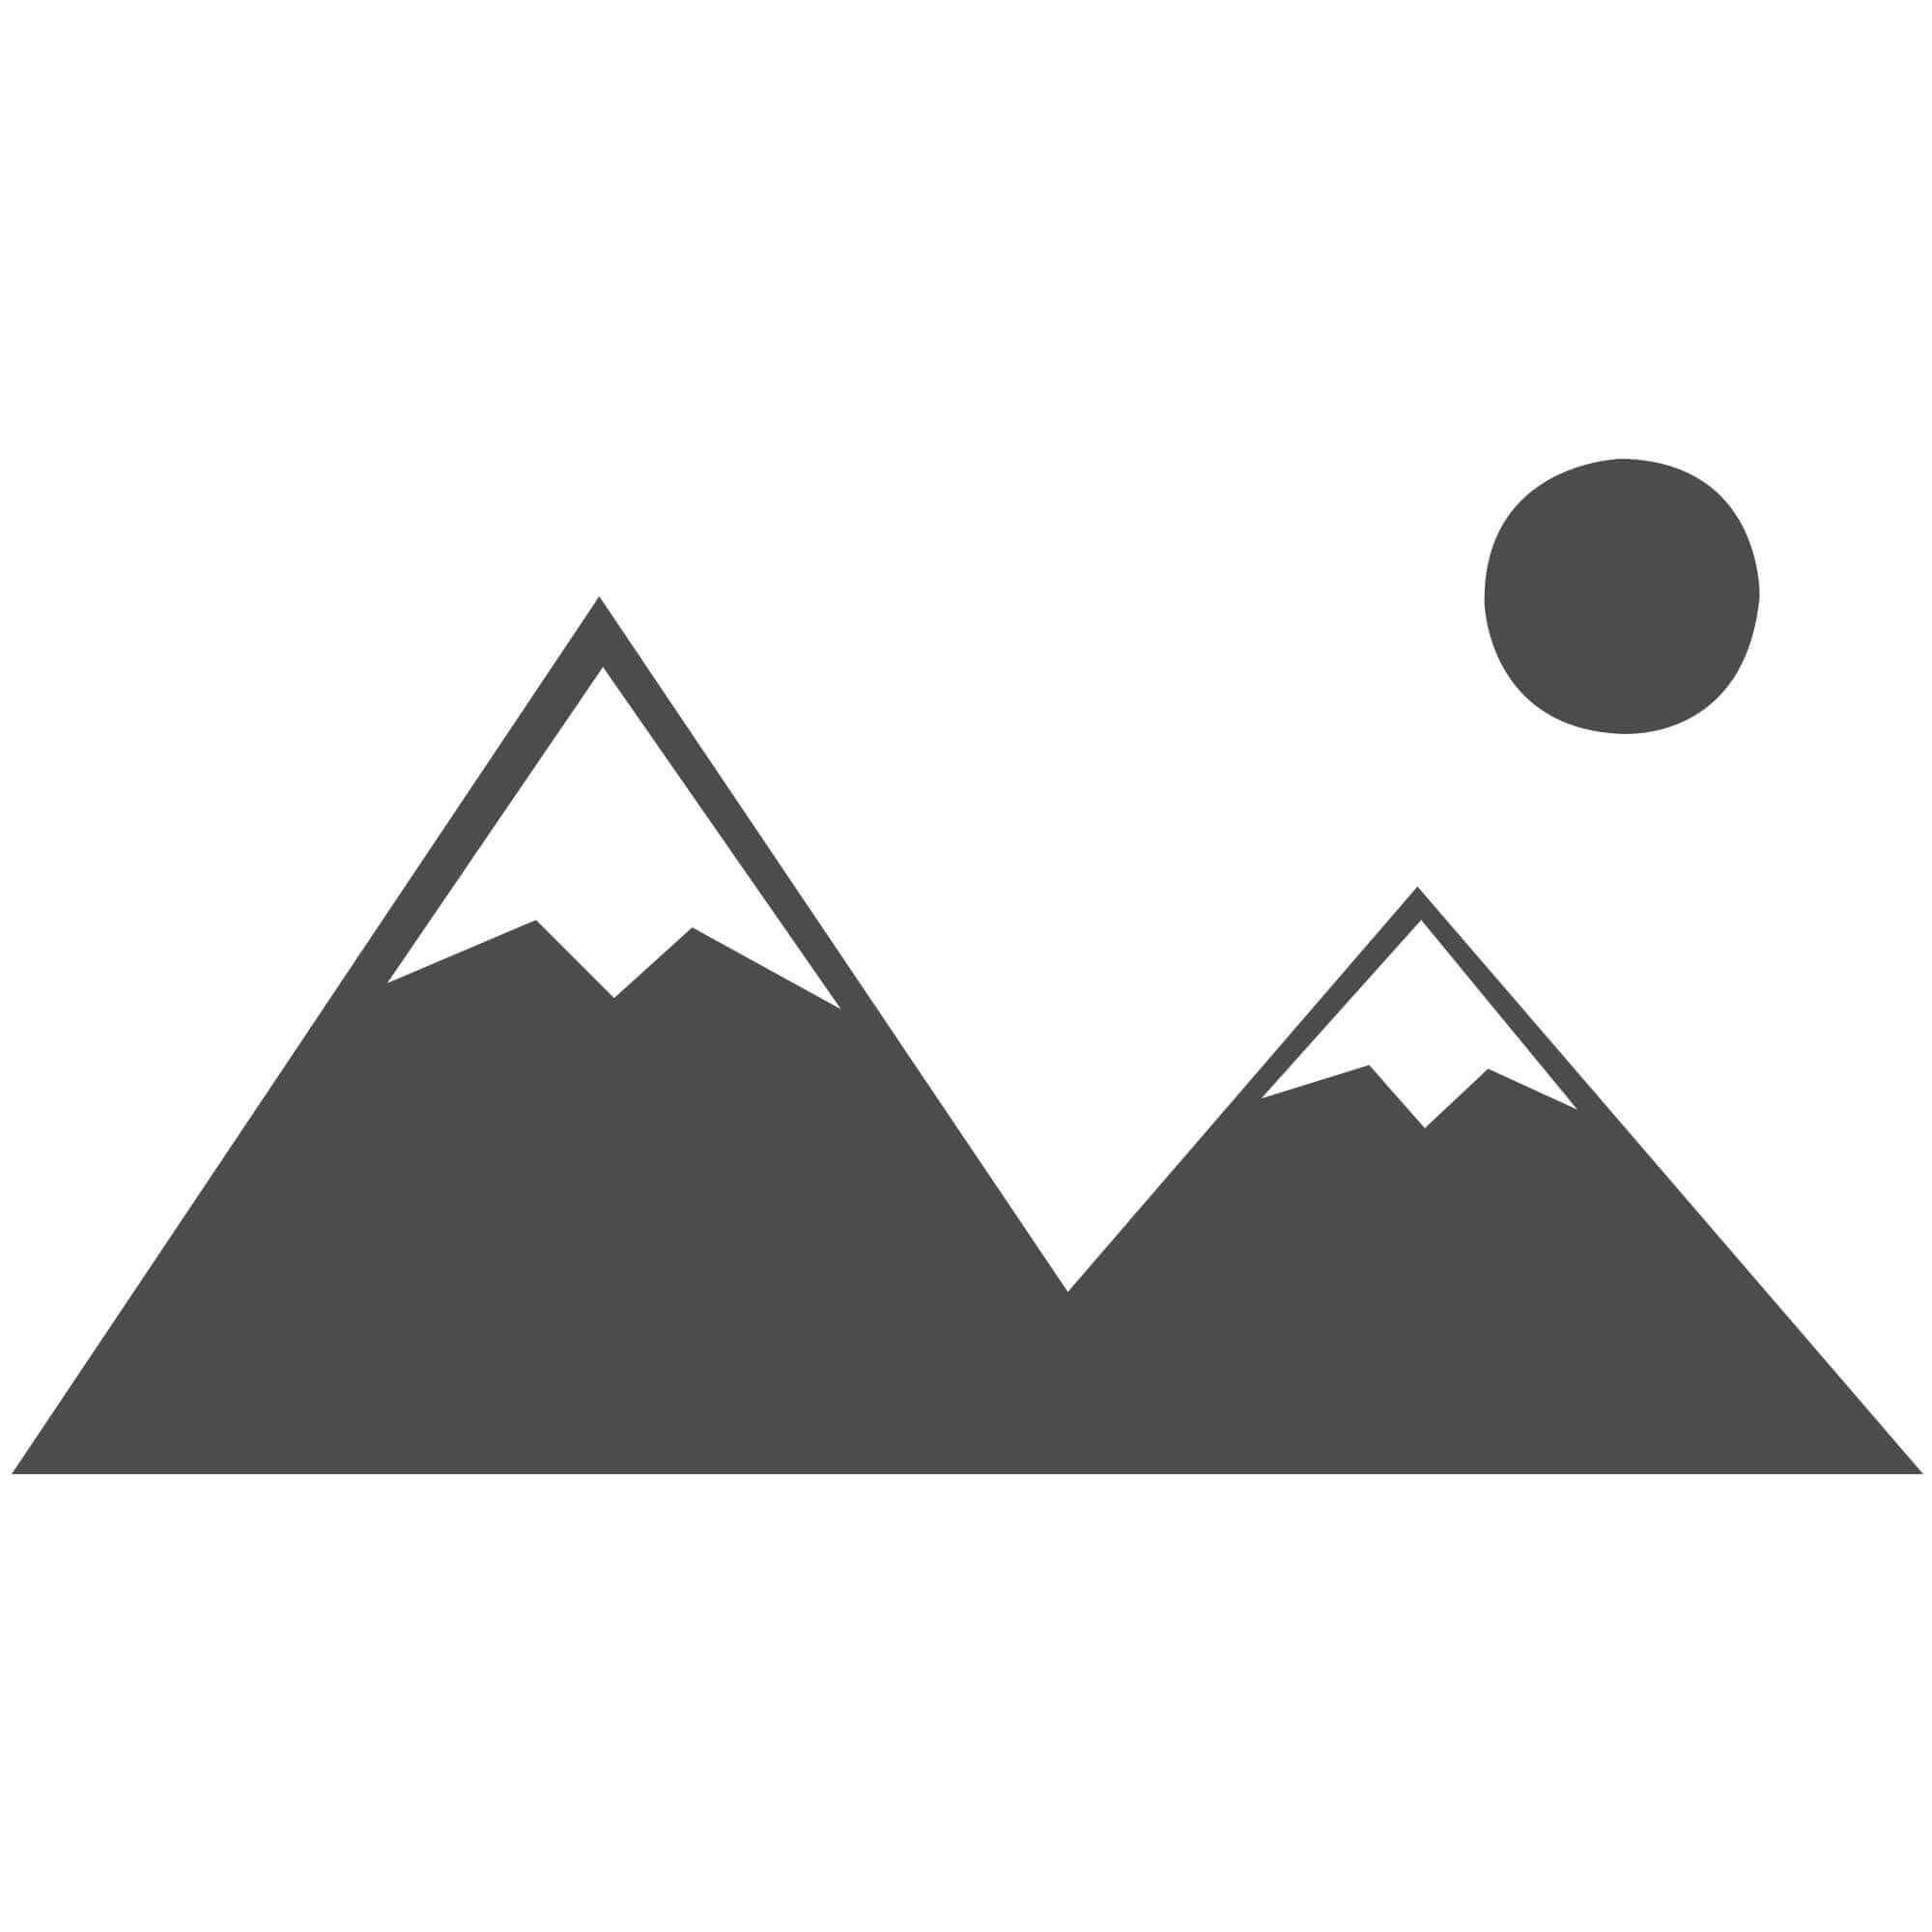 "Kashqai Traditional Persian Design Rug - 4308/300-200 x 300 cm (6'7"" x 9'10"")"